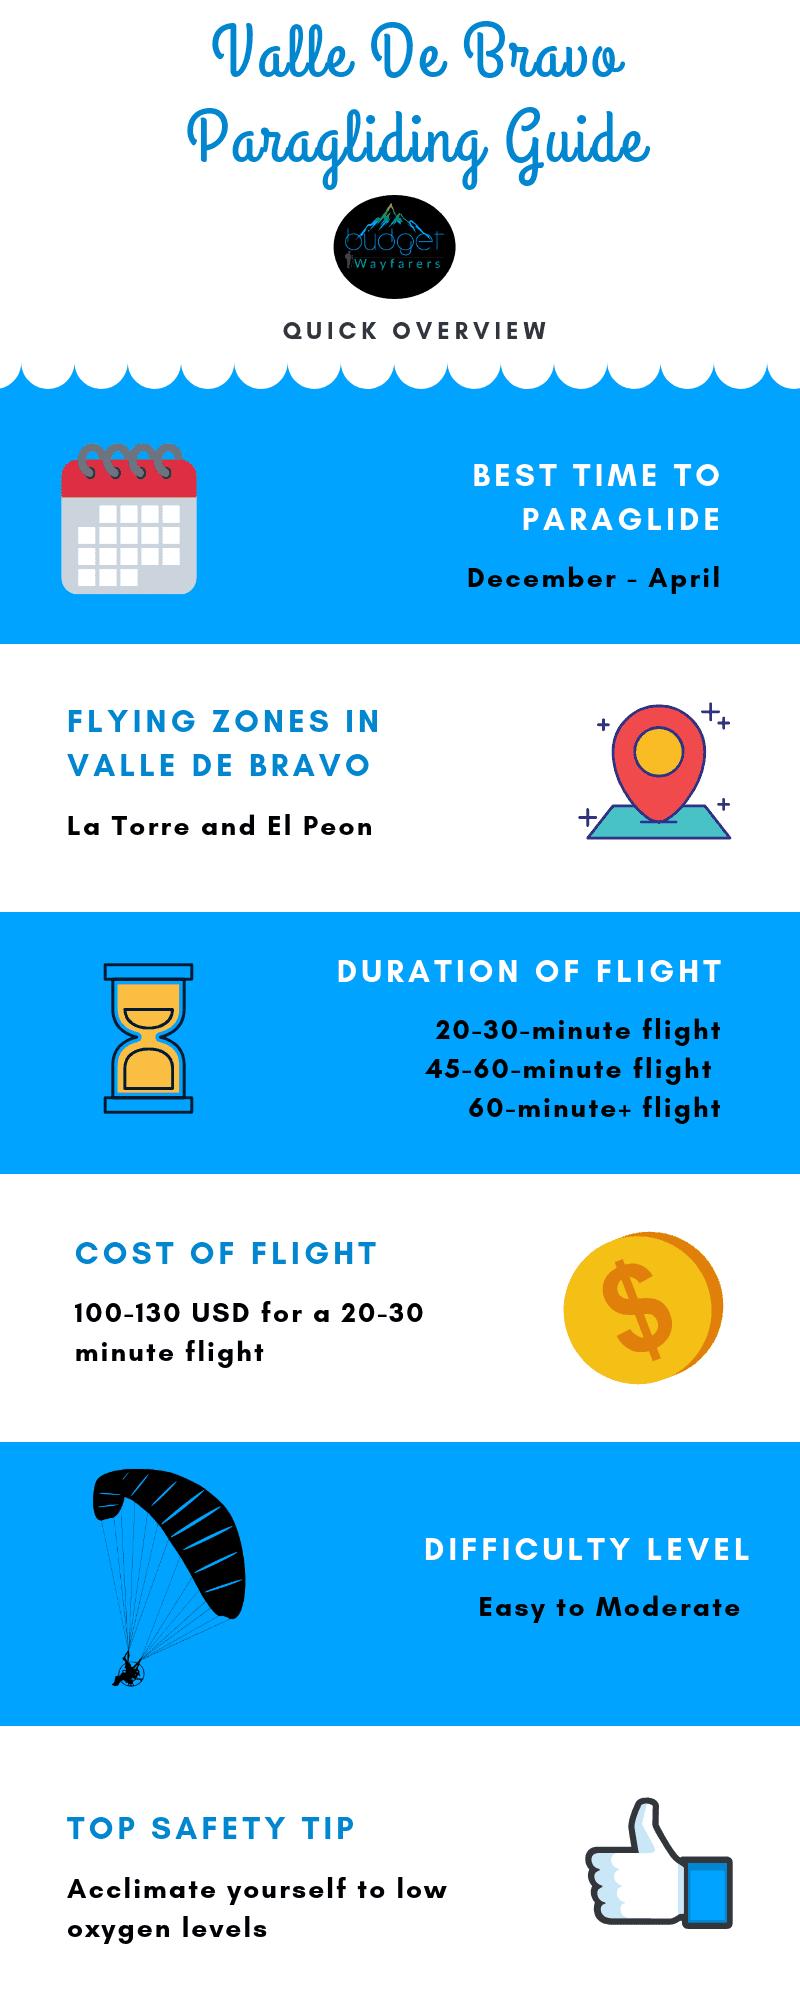 Valle De Bravo Paragliding Guide-min